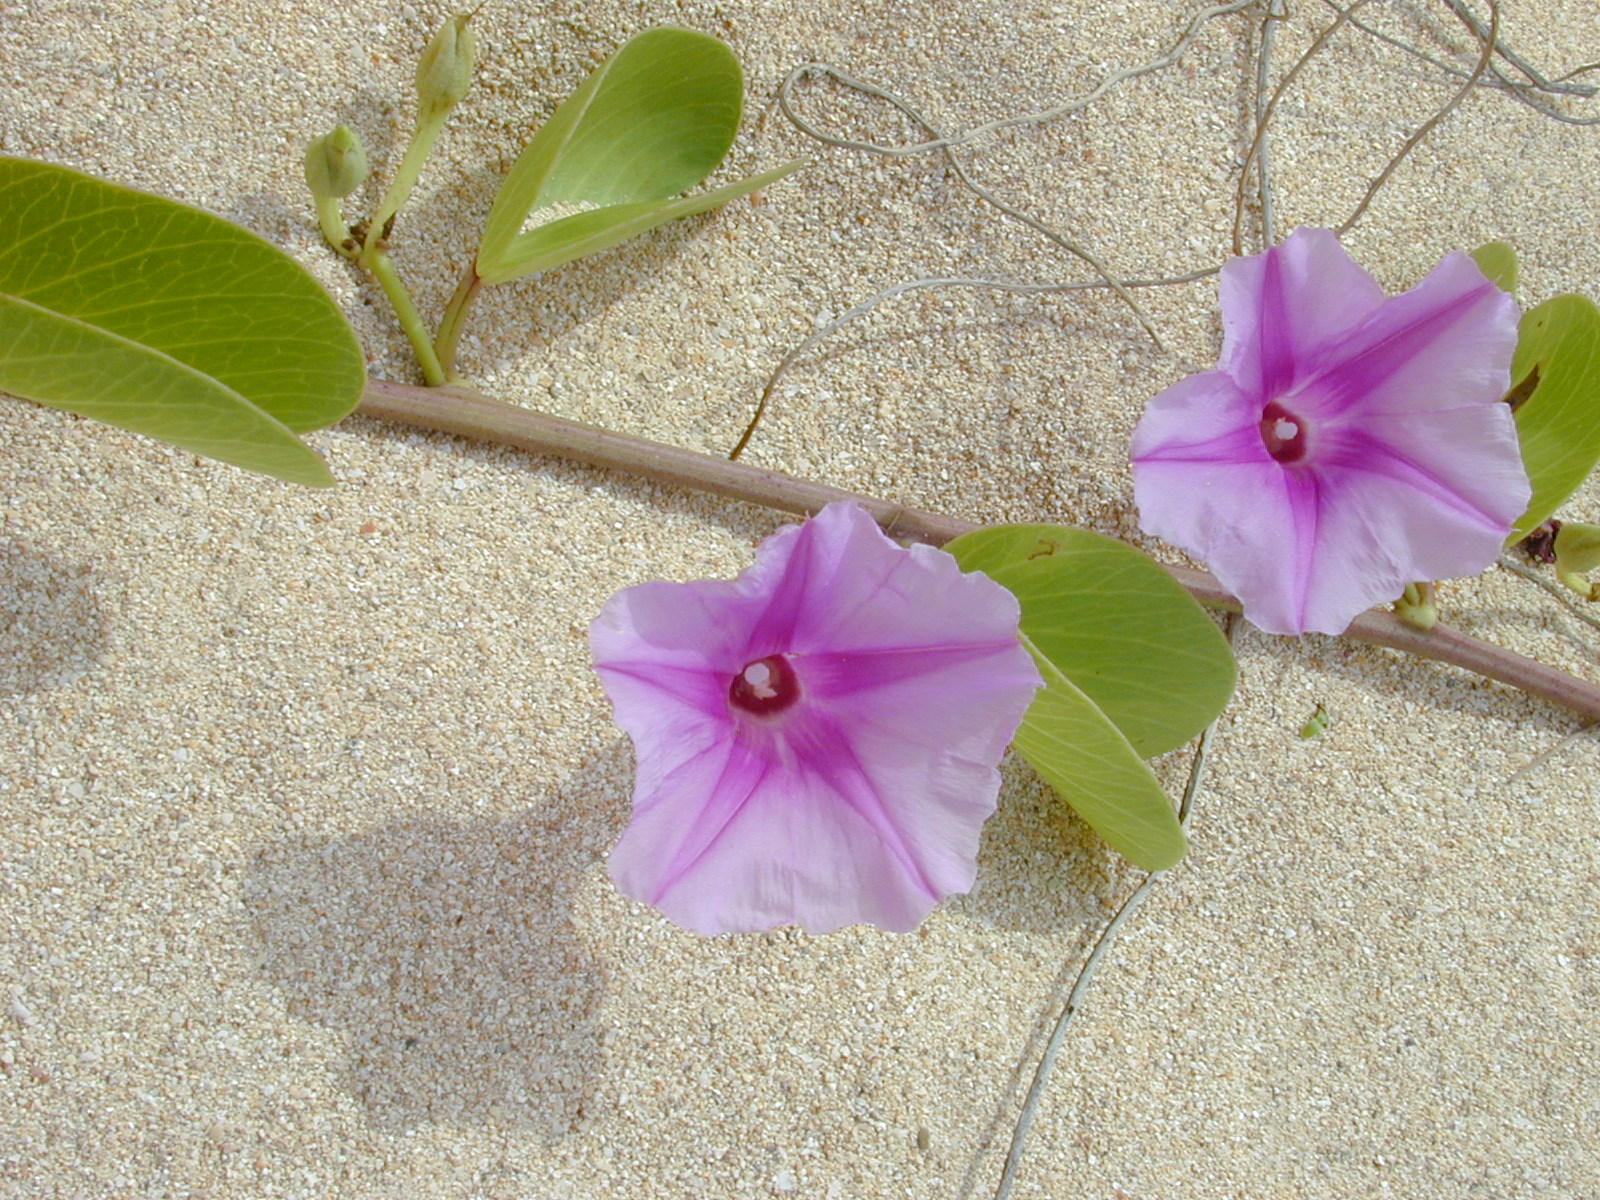 Kanaha beach park maui natural areas of hawaii native plants and beach goers at kanaha beach maui izmirmasajfo